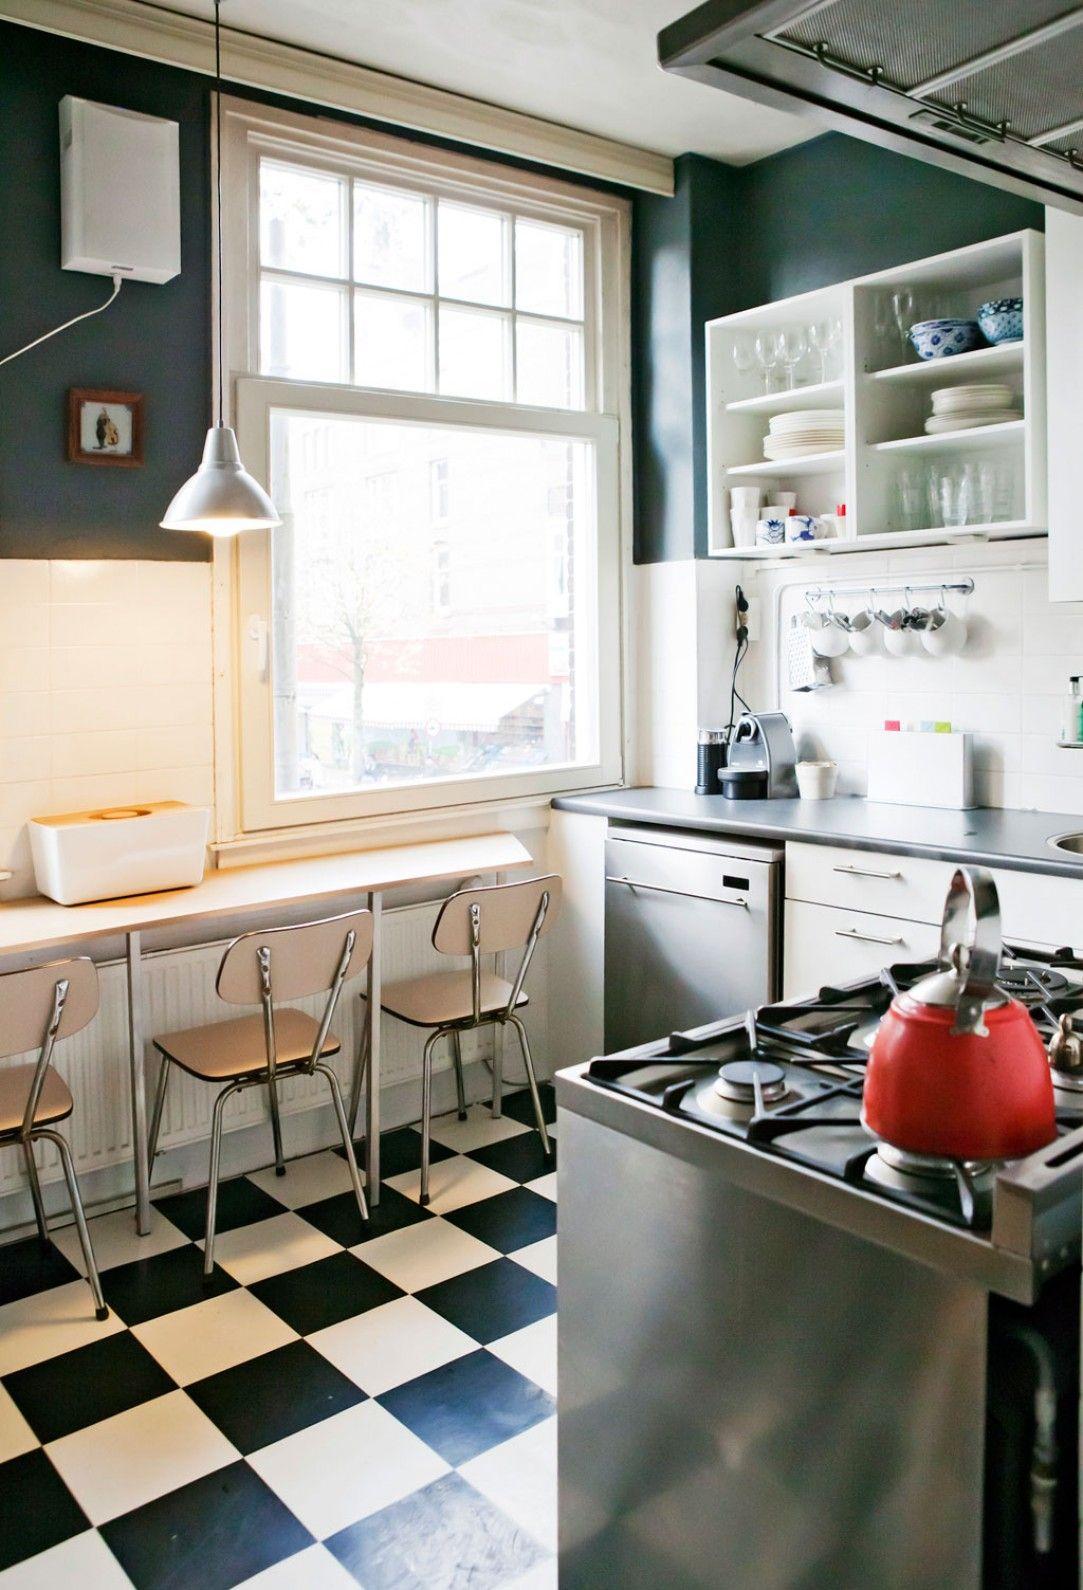 Appartement In Amsterdam Vtwonen Binnenkijker Vtwonen Keuken Zwart Wit Appartement Keuken Zwart